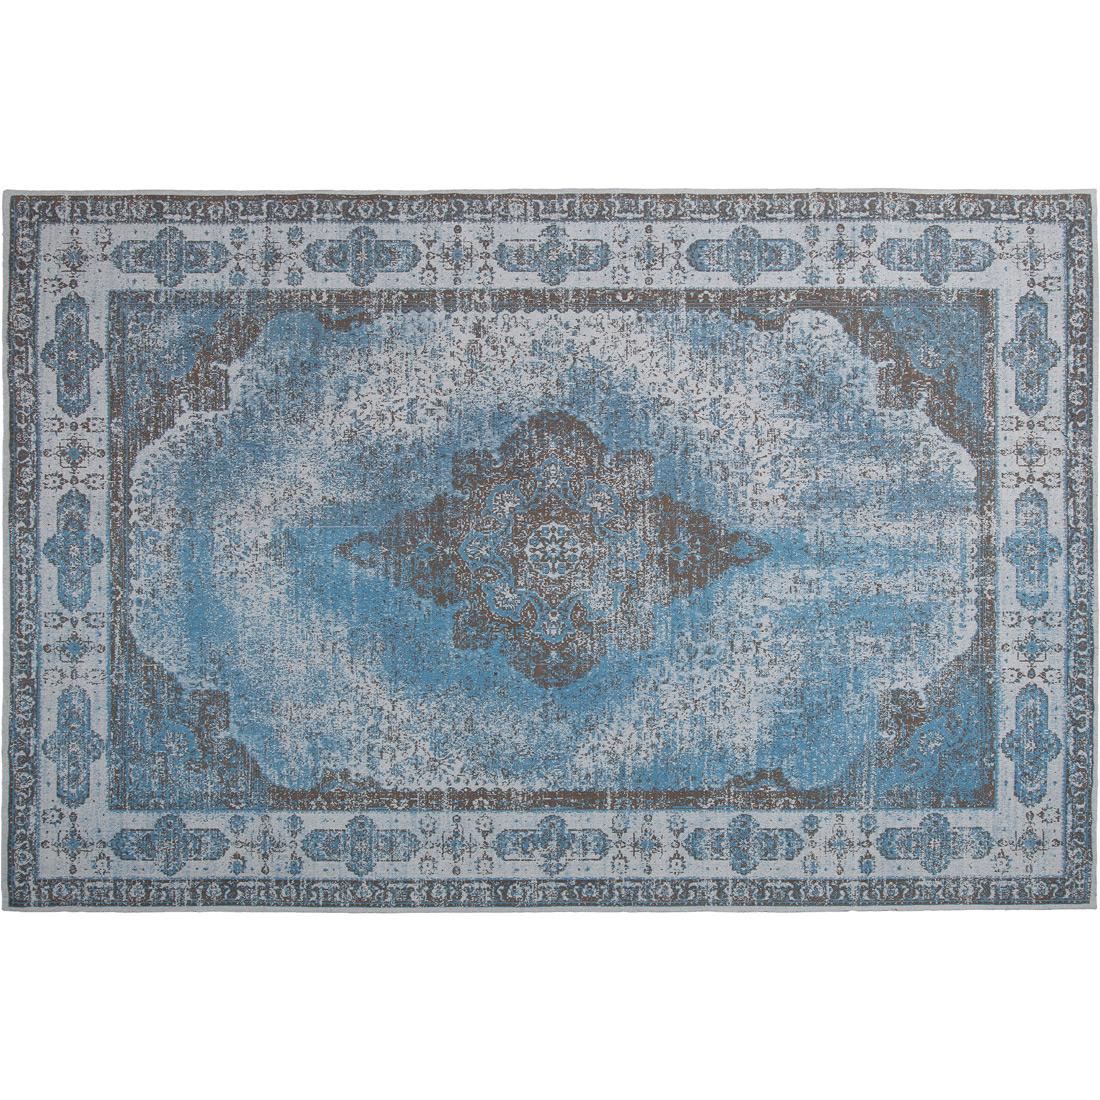 Vloerkleed Xilento Design Azur Blue 2 | 160 x 230 cm